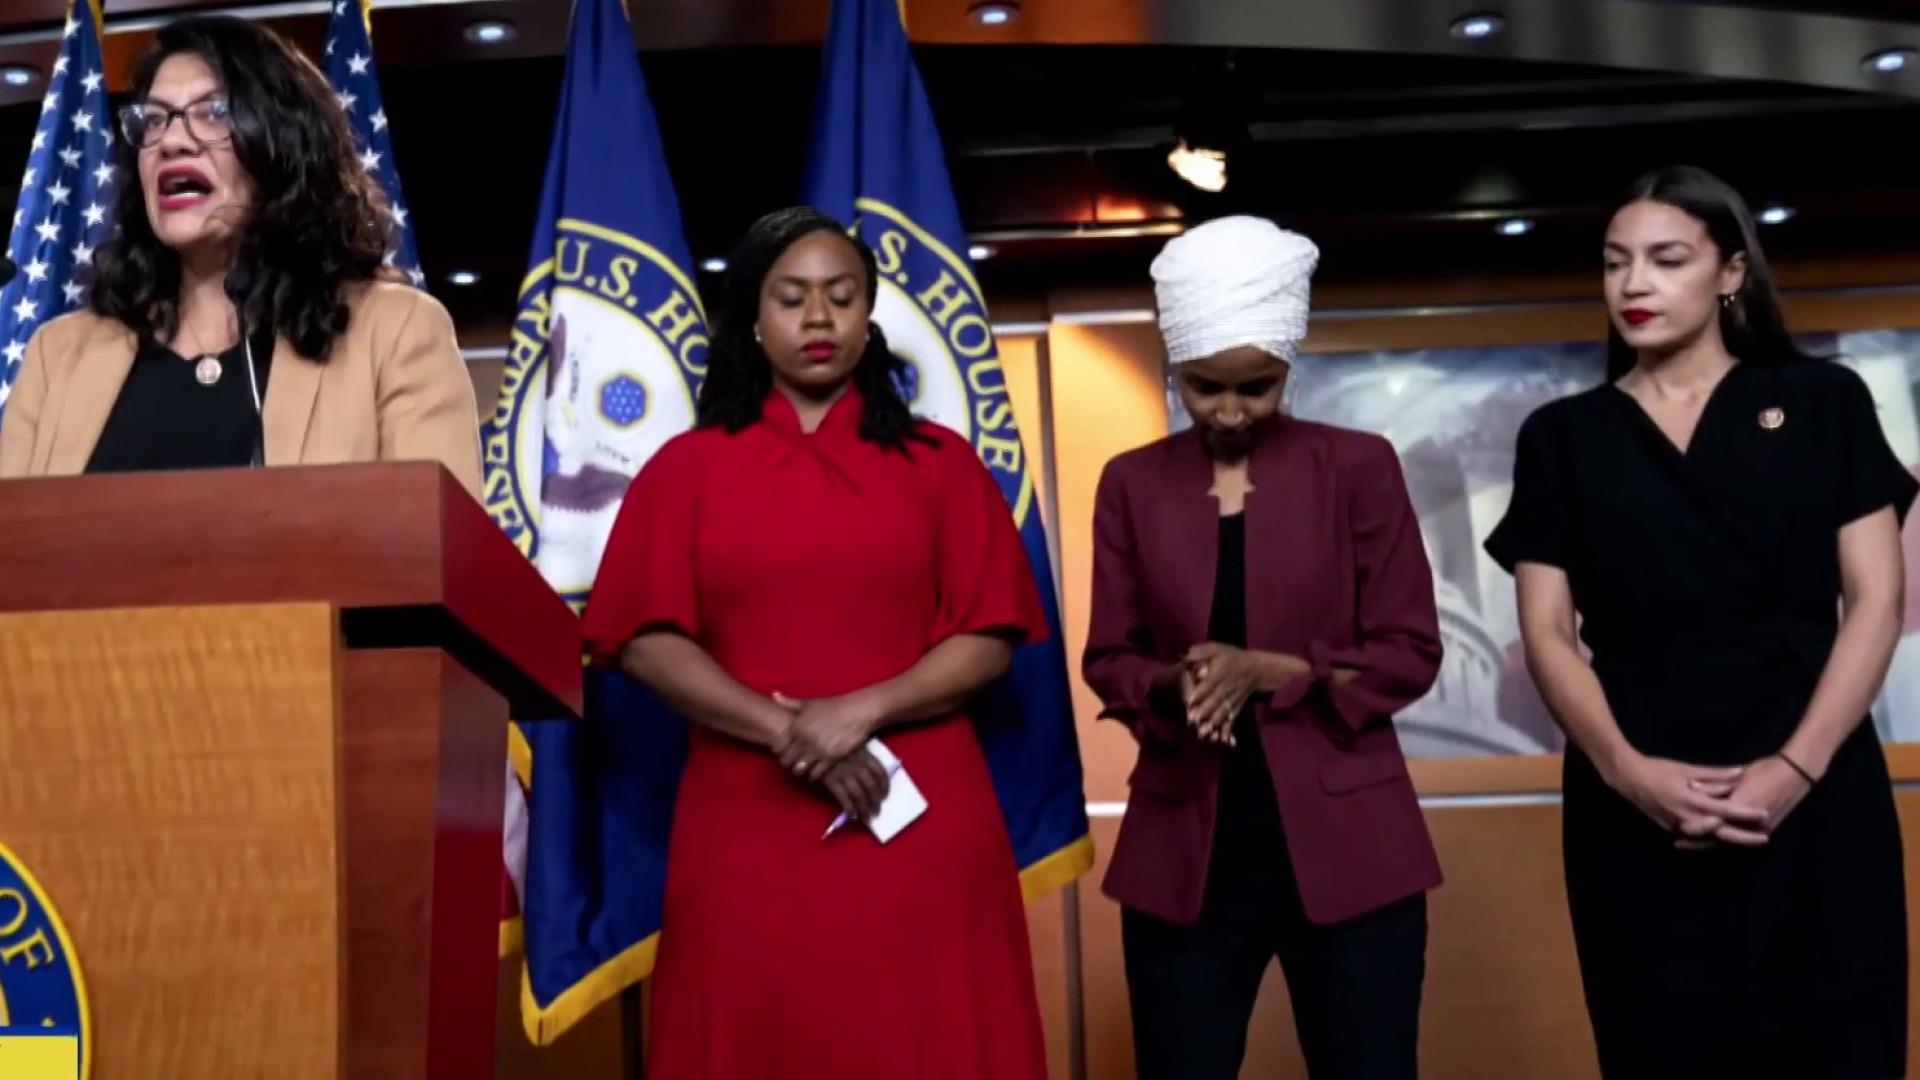 House Democrats pledge unity after Trump attacks 'The Squad'